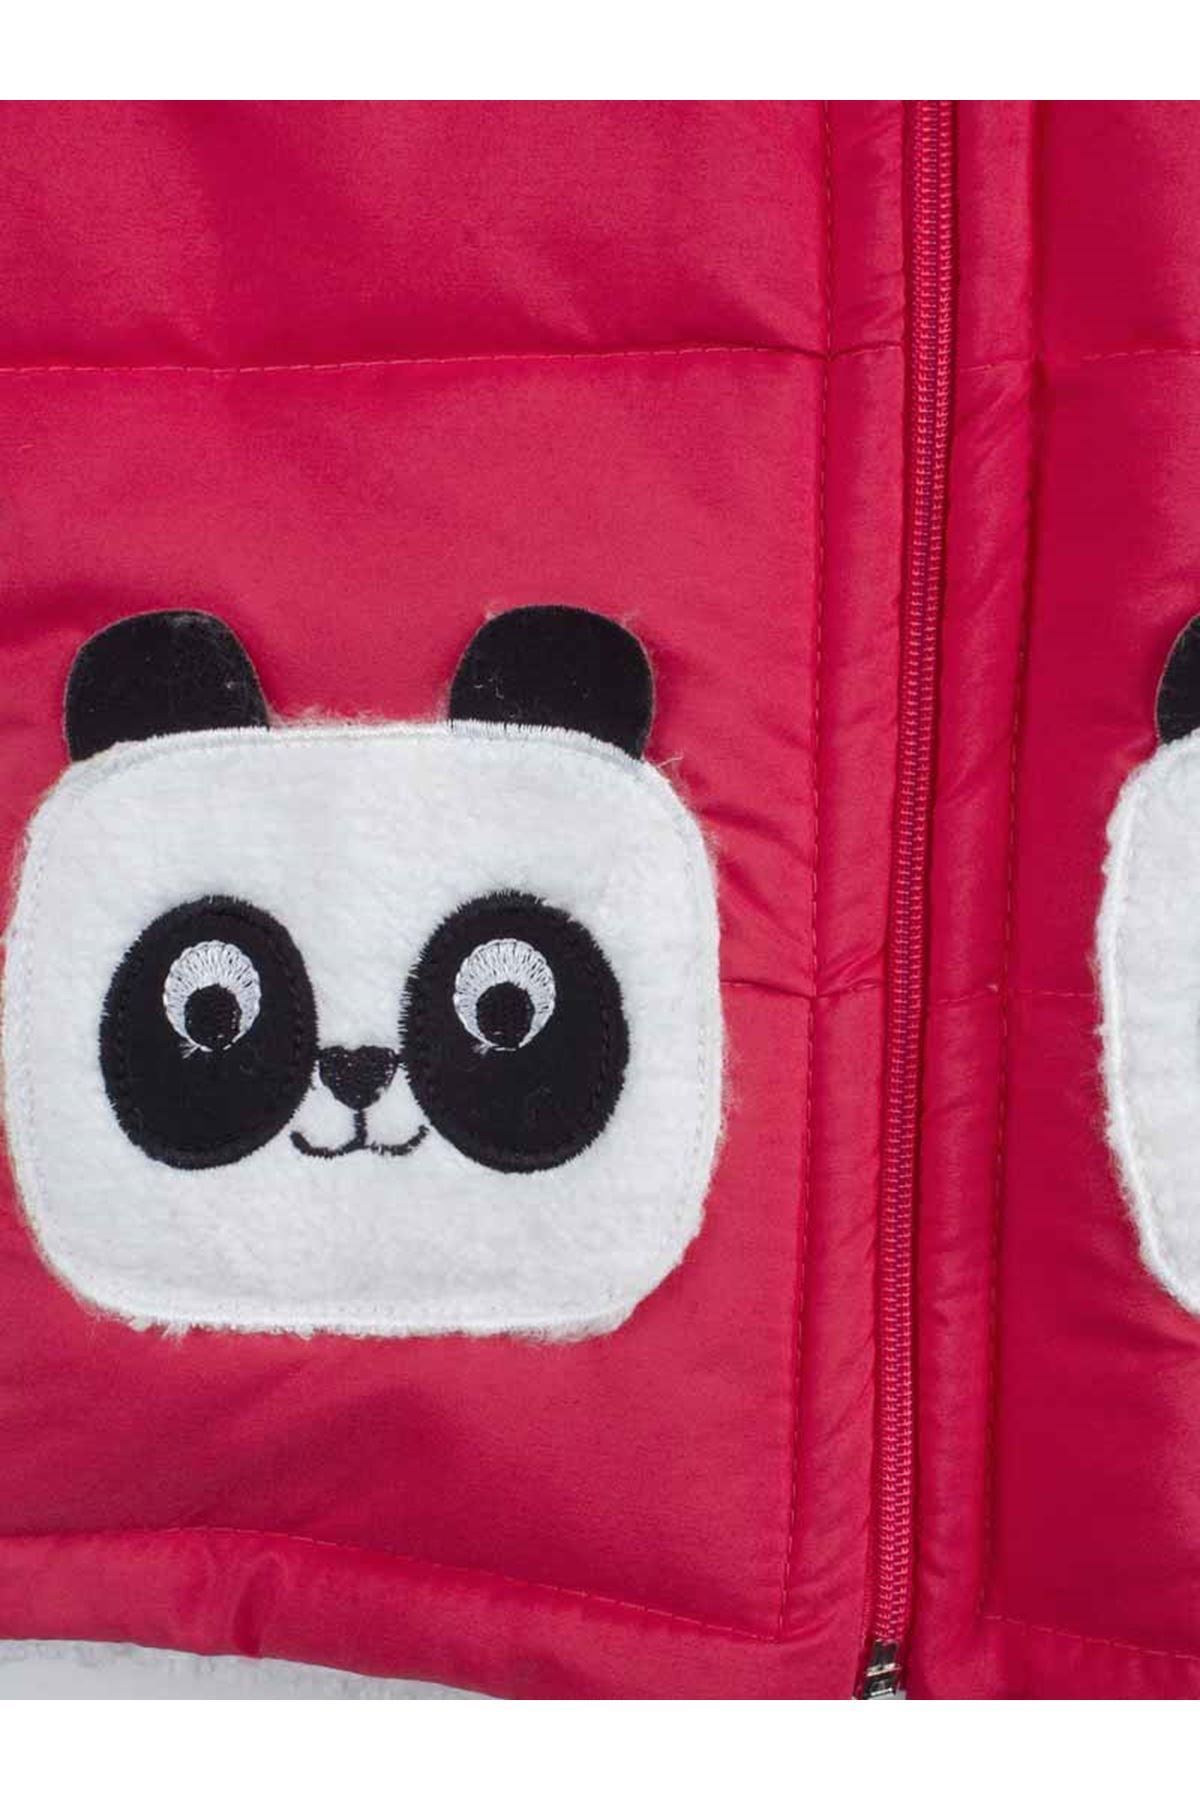 Grenadine red The Panda Female Child Hooded coats